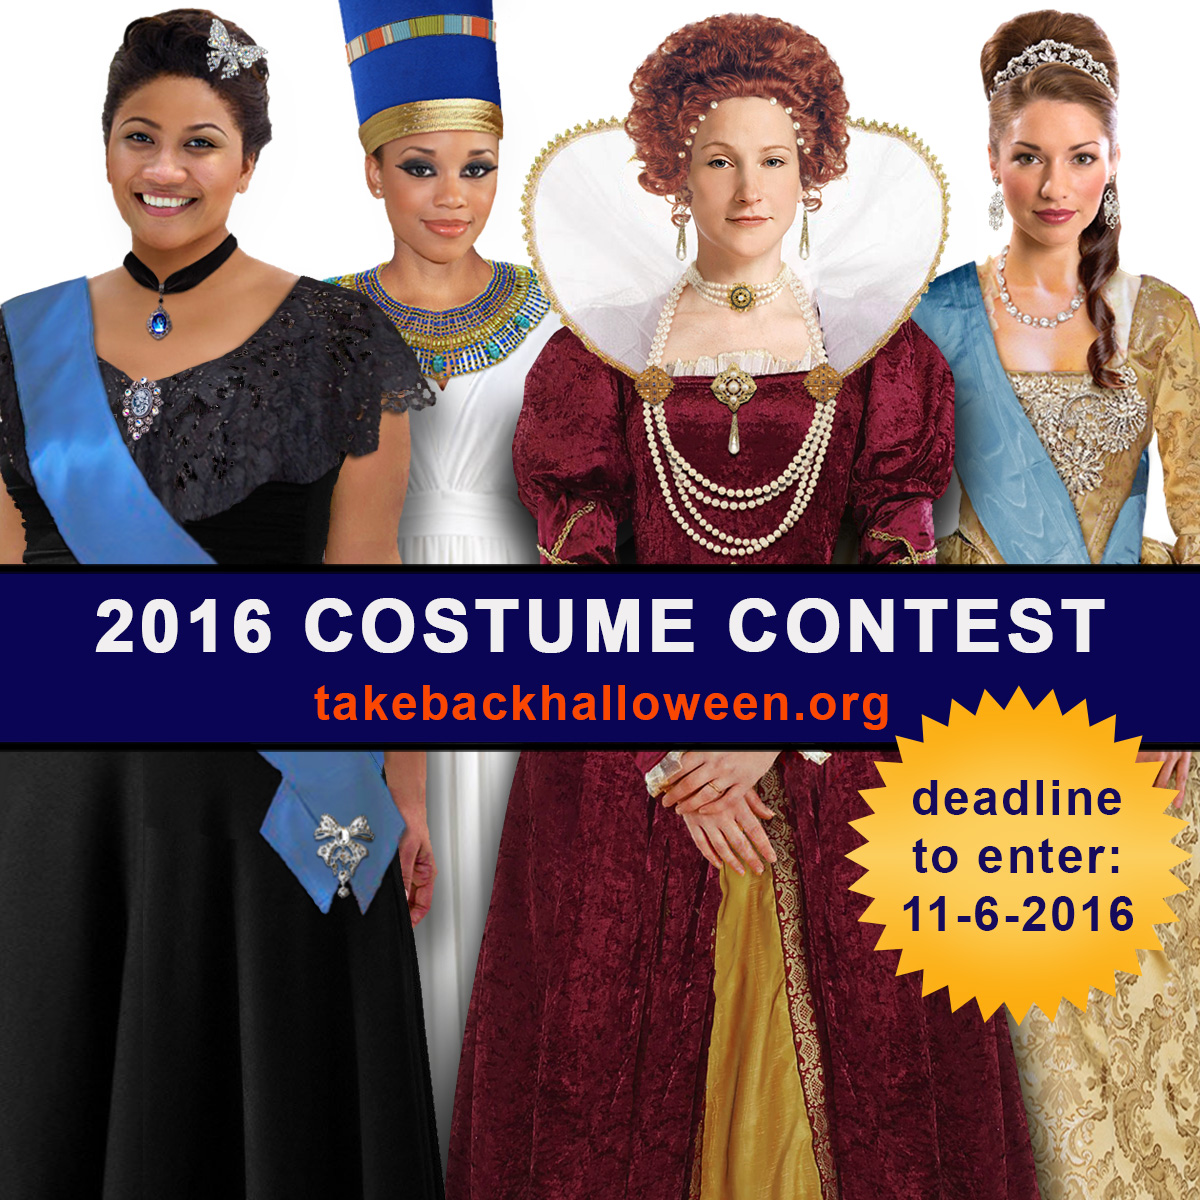 Take Back Halloween 2016 Costume Contest